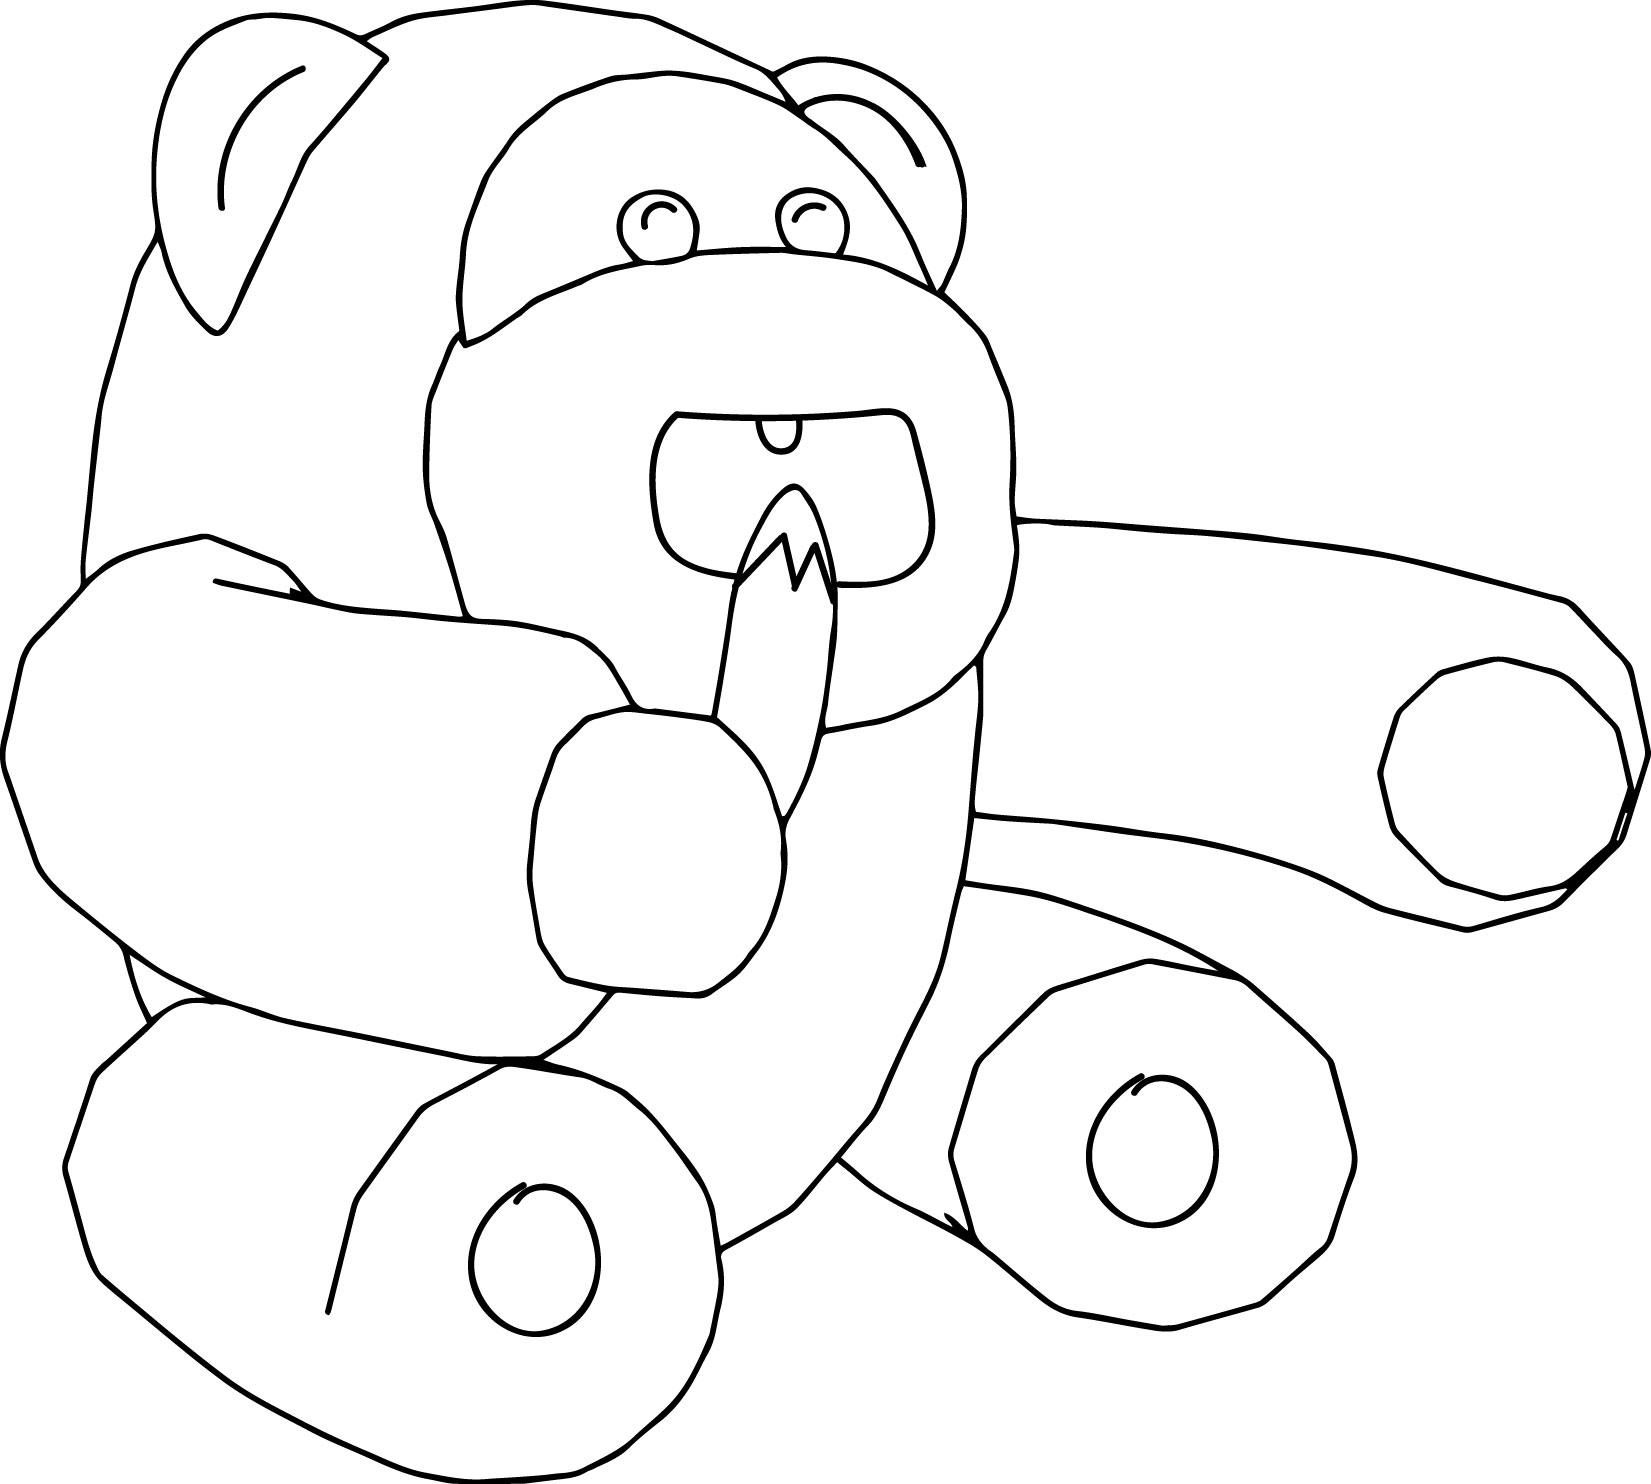 Monkey Eat Banana Coloring Page